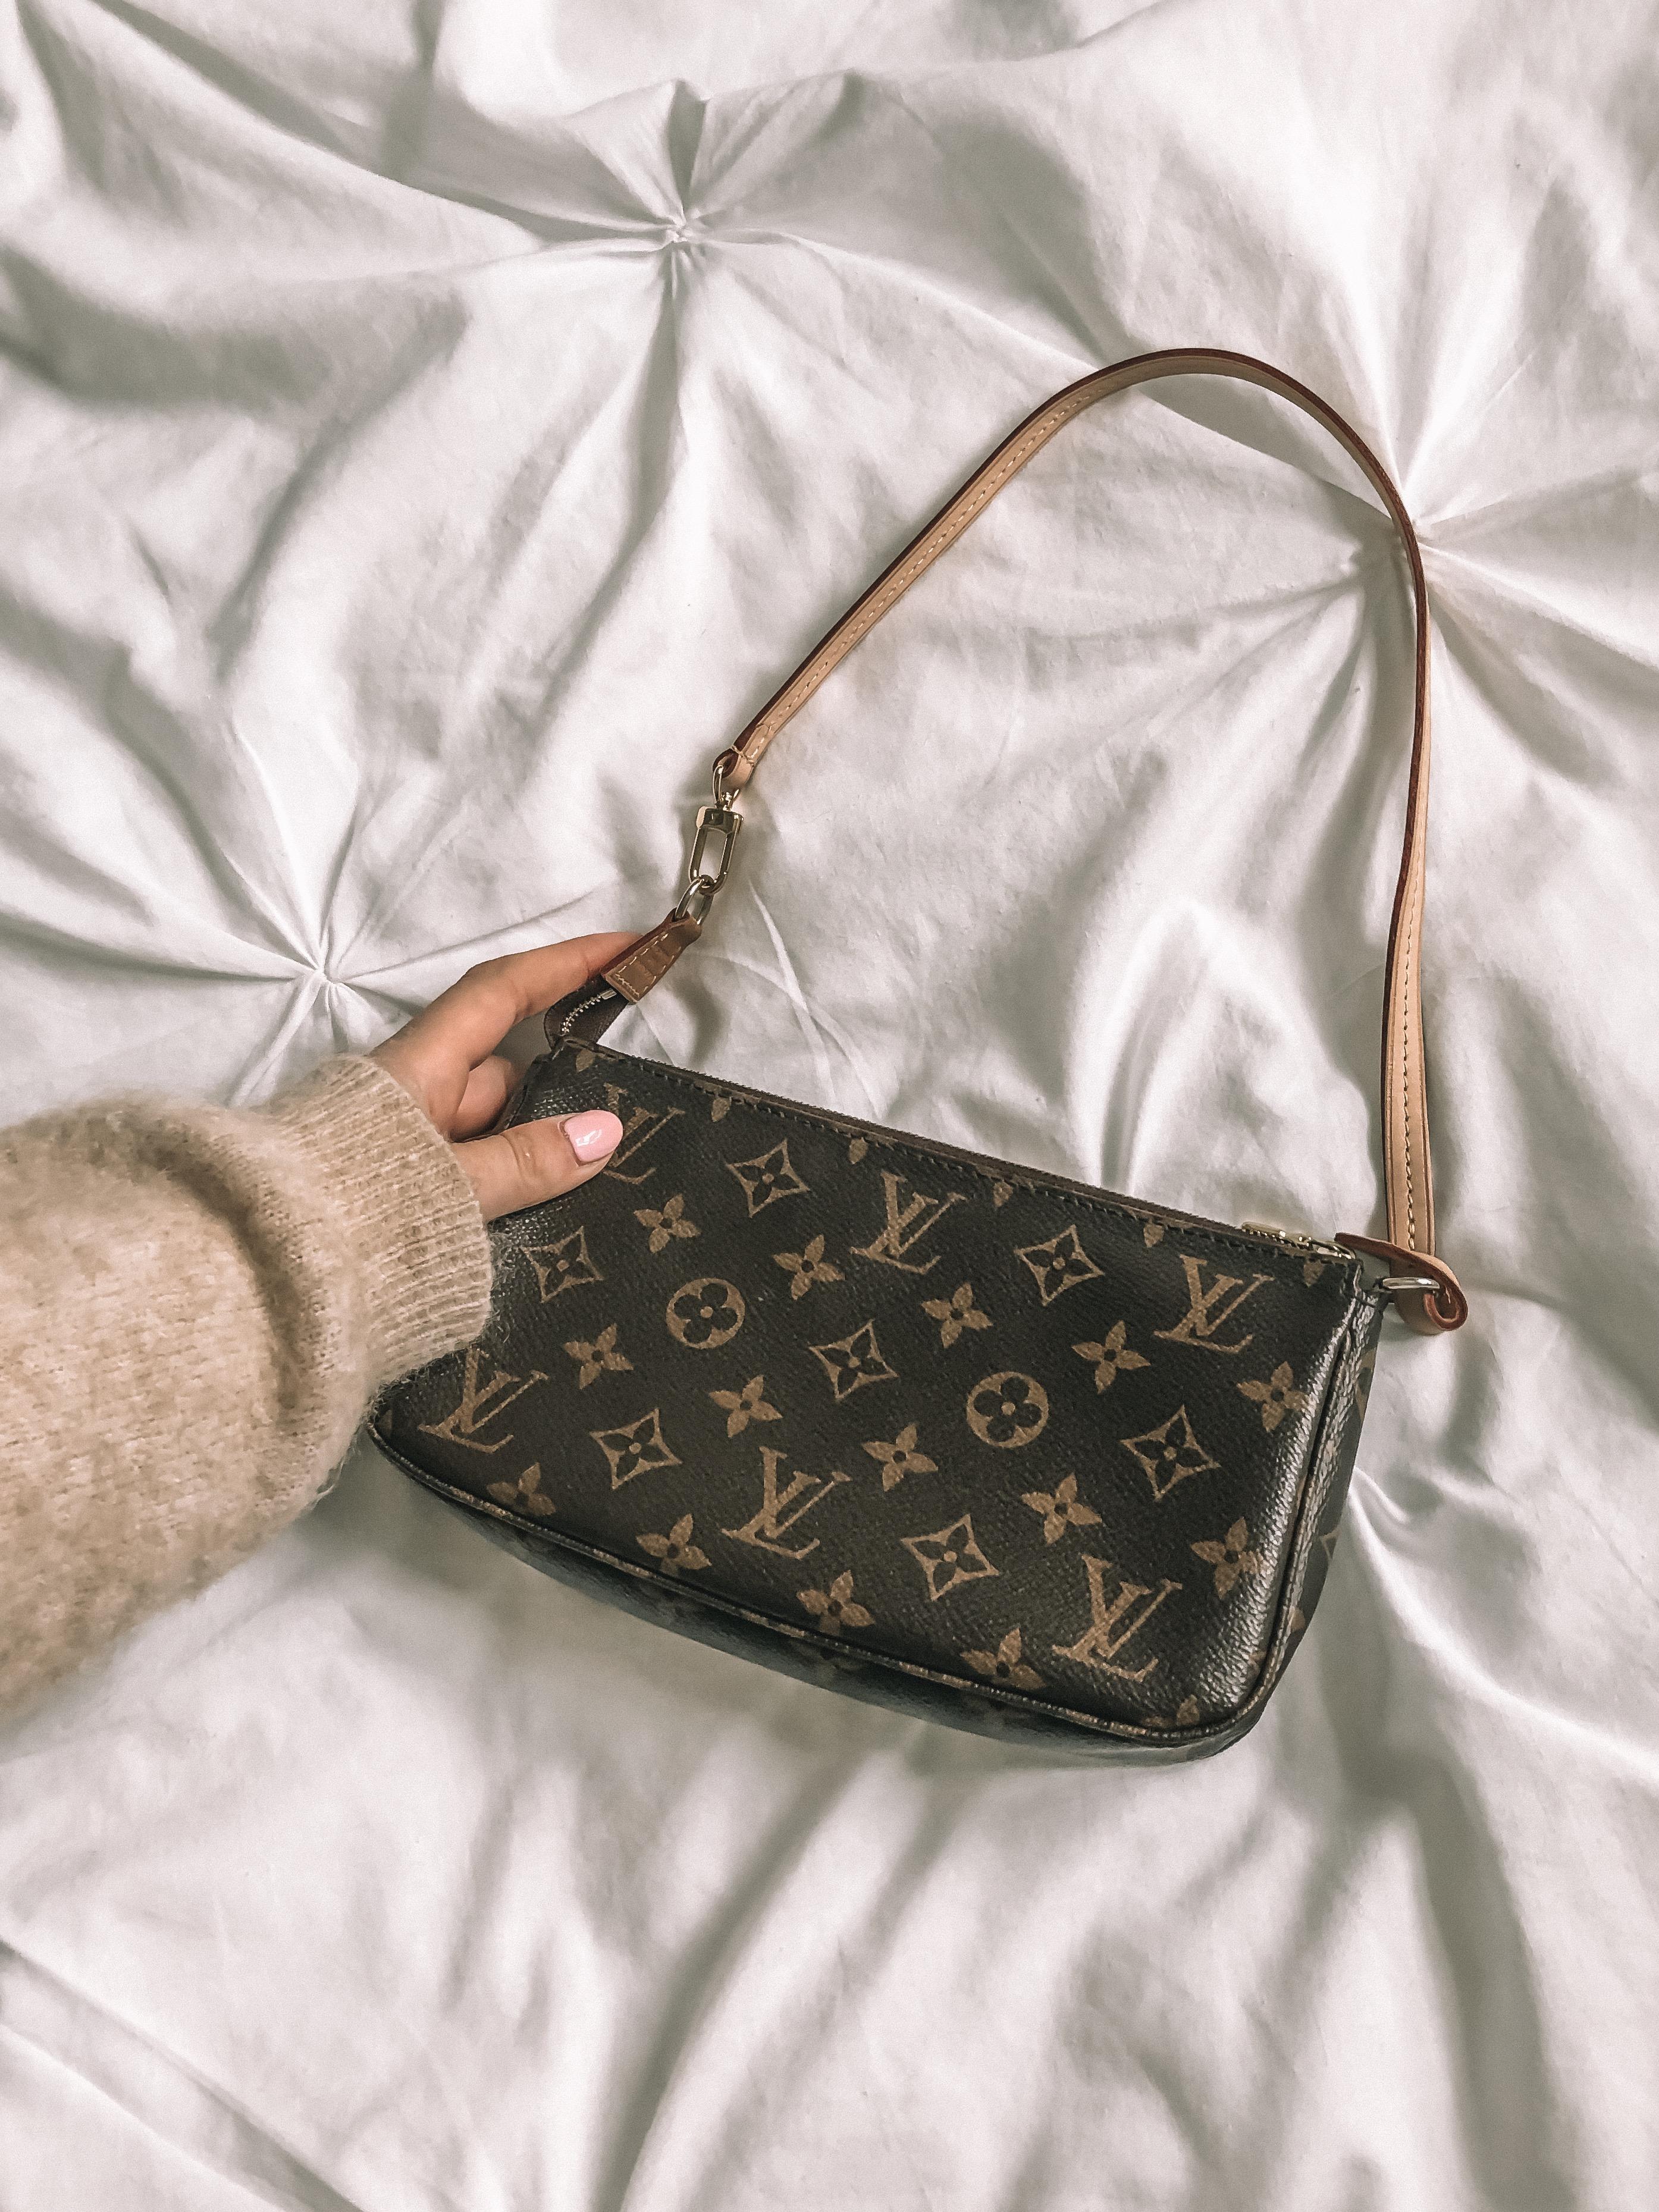 90s Handbag - Louis Vuitton Pochette Accessorie Mini Handbag